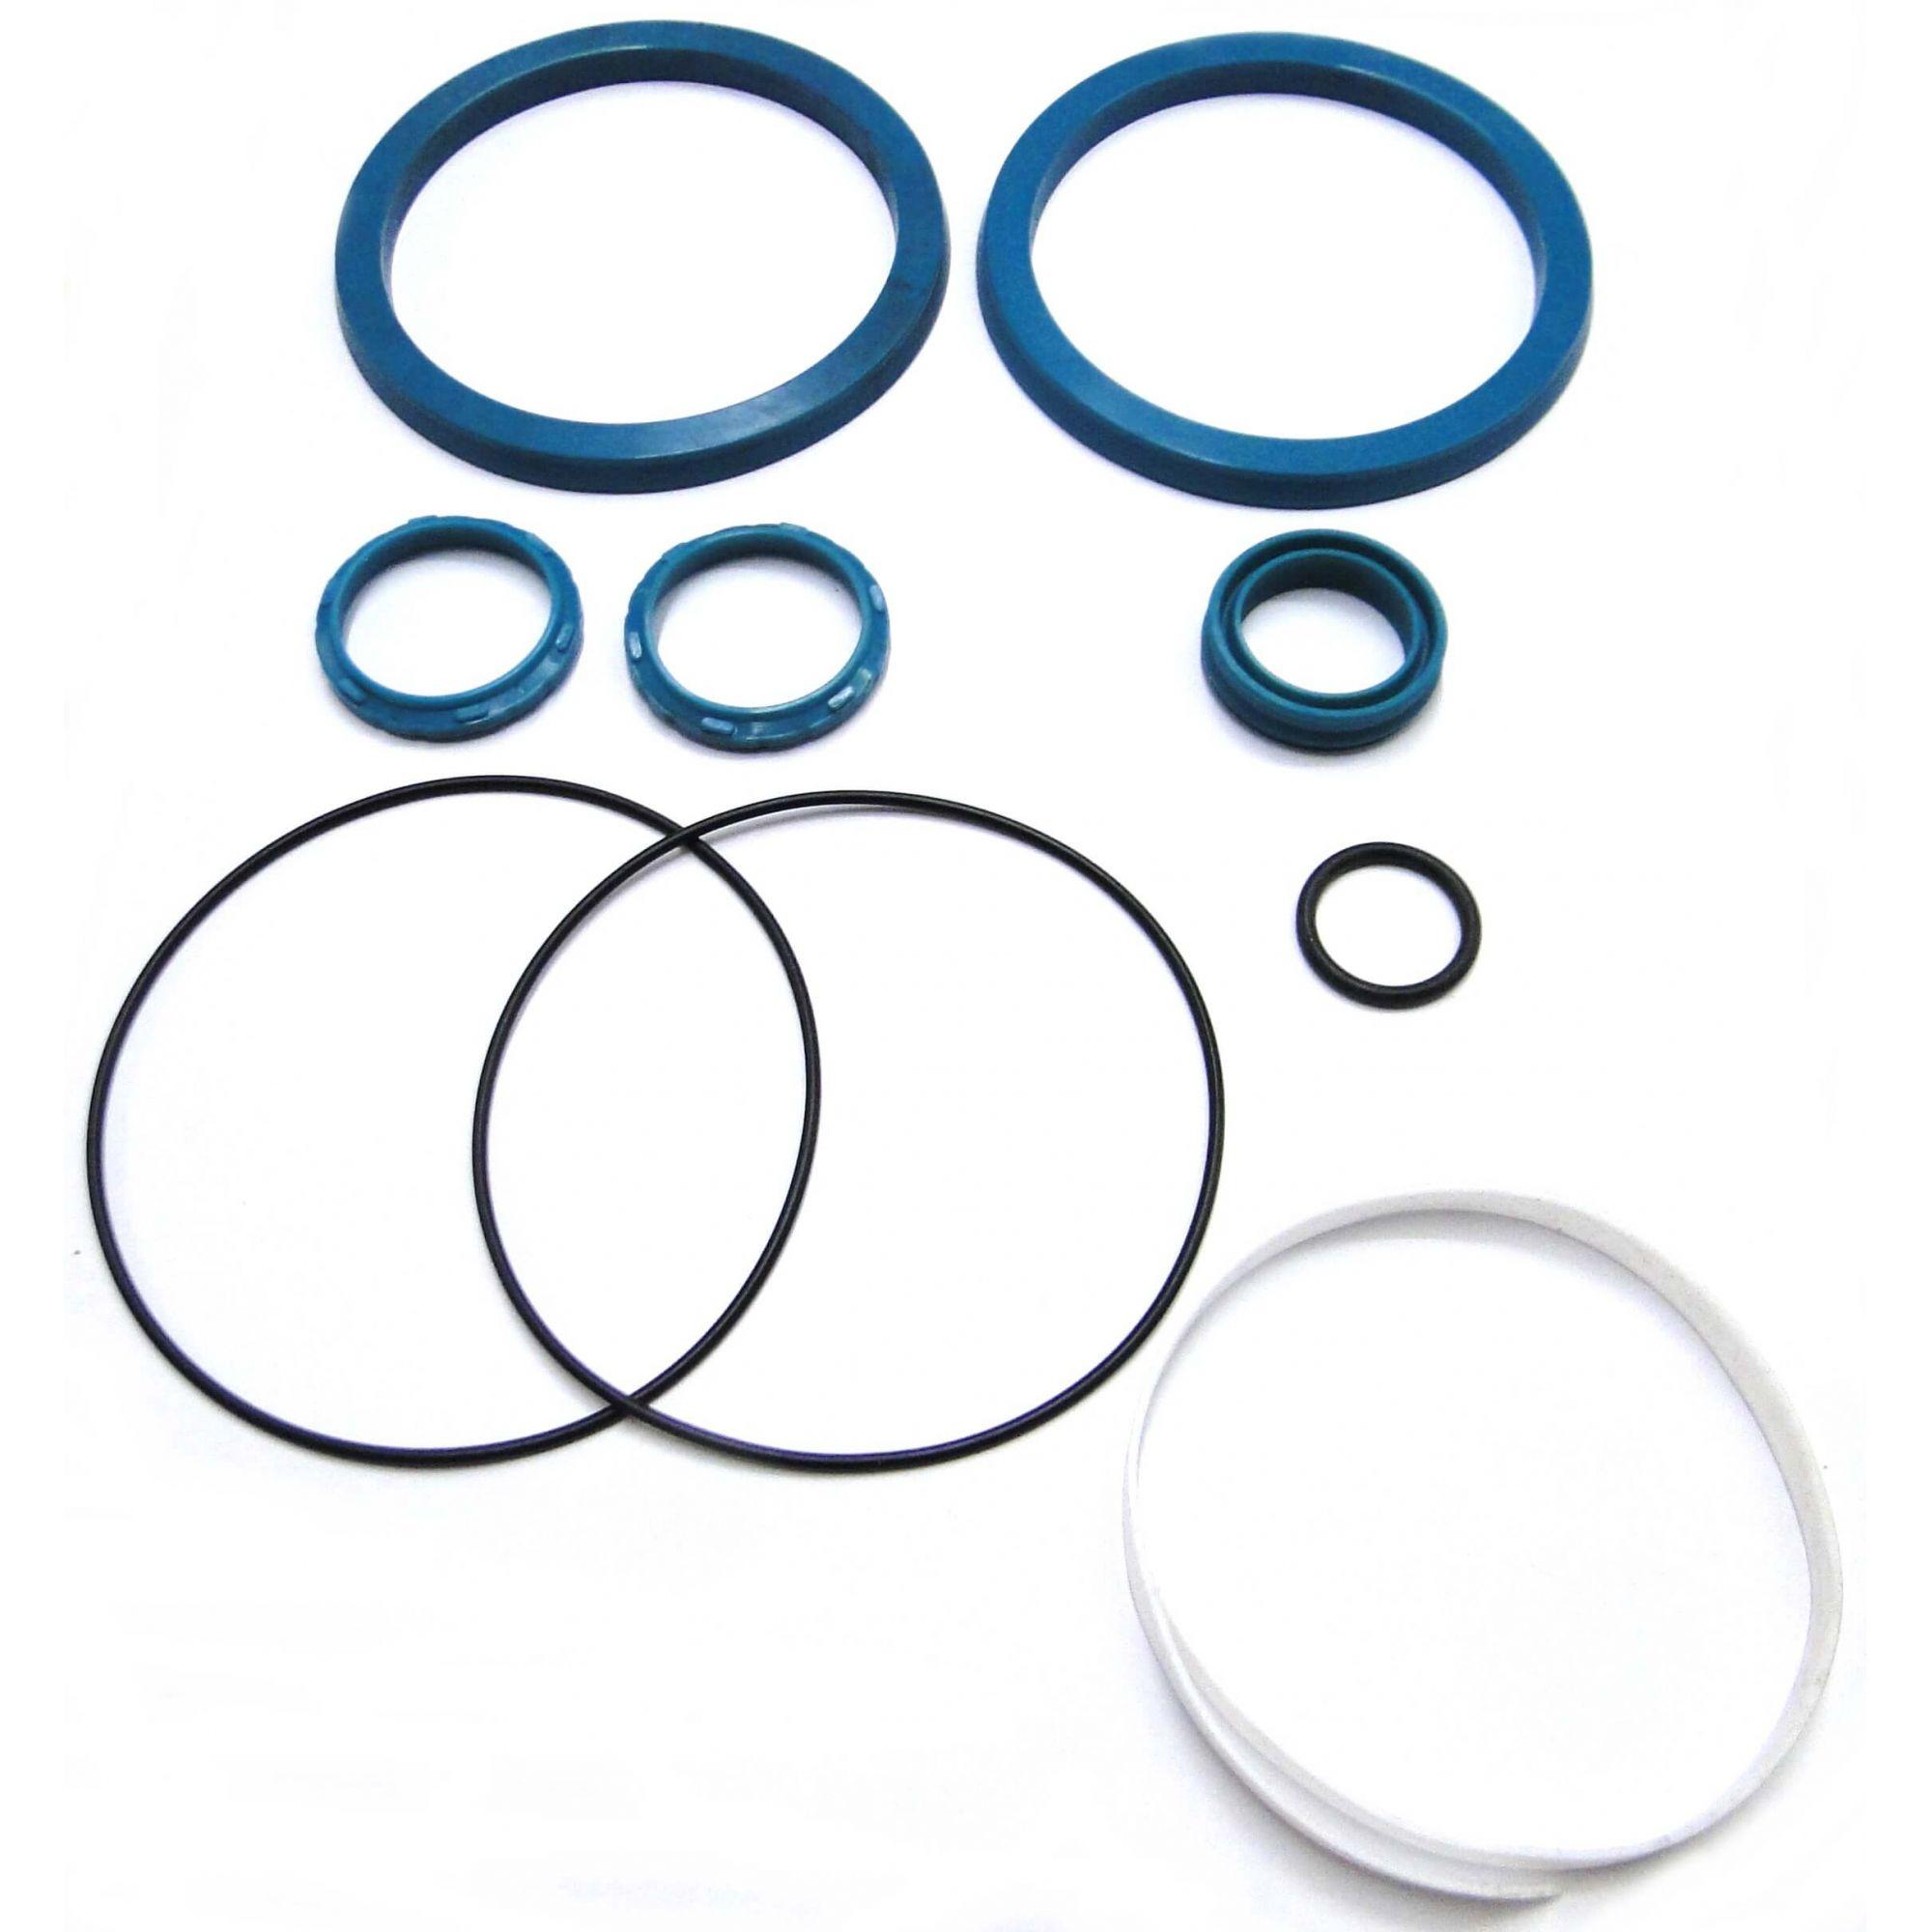 Kit Reparo para Cilindro Pneumático Haste Simples E125 Werk Schott